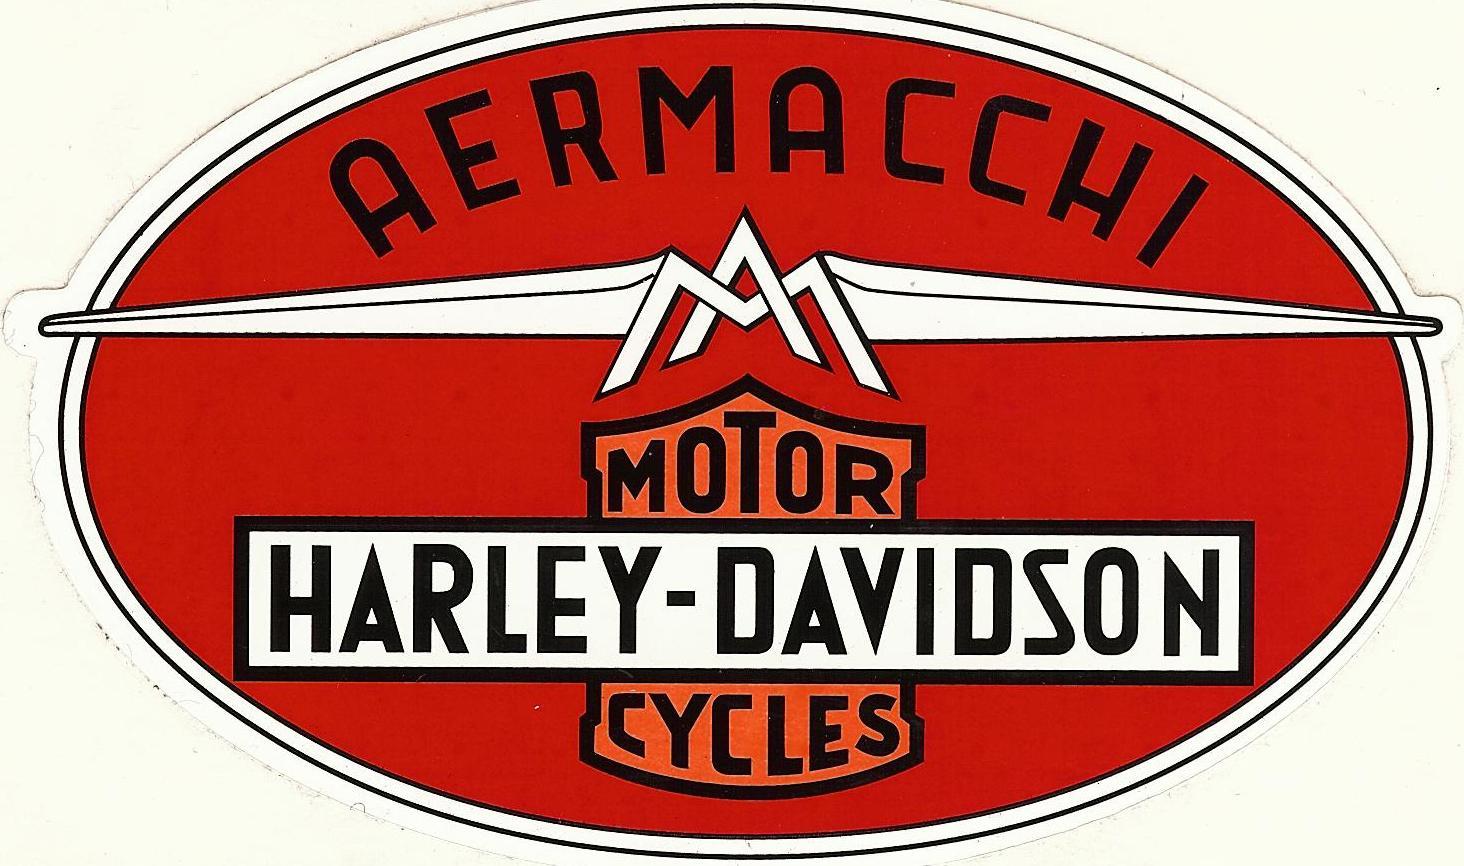 Aermacchi Logo Wallpaper